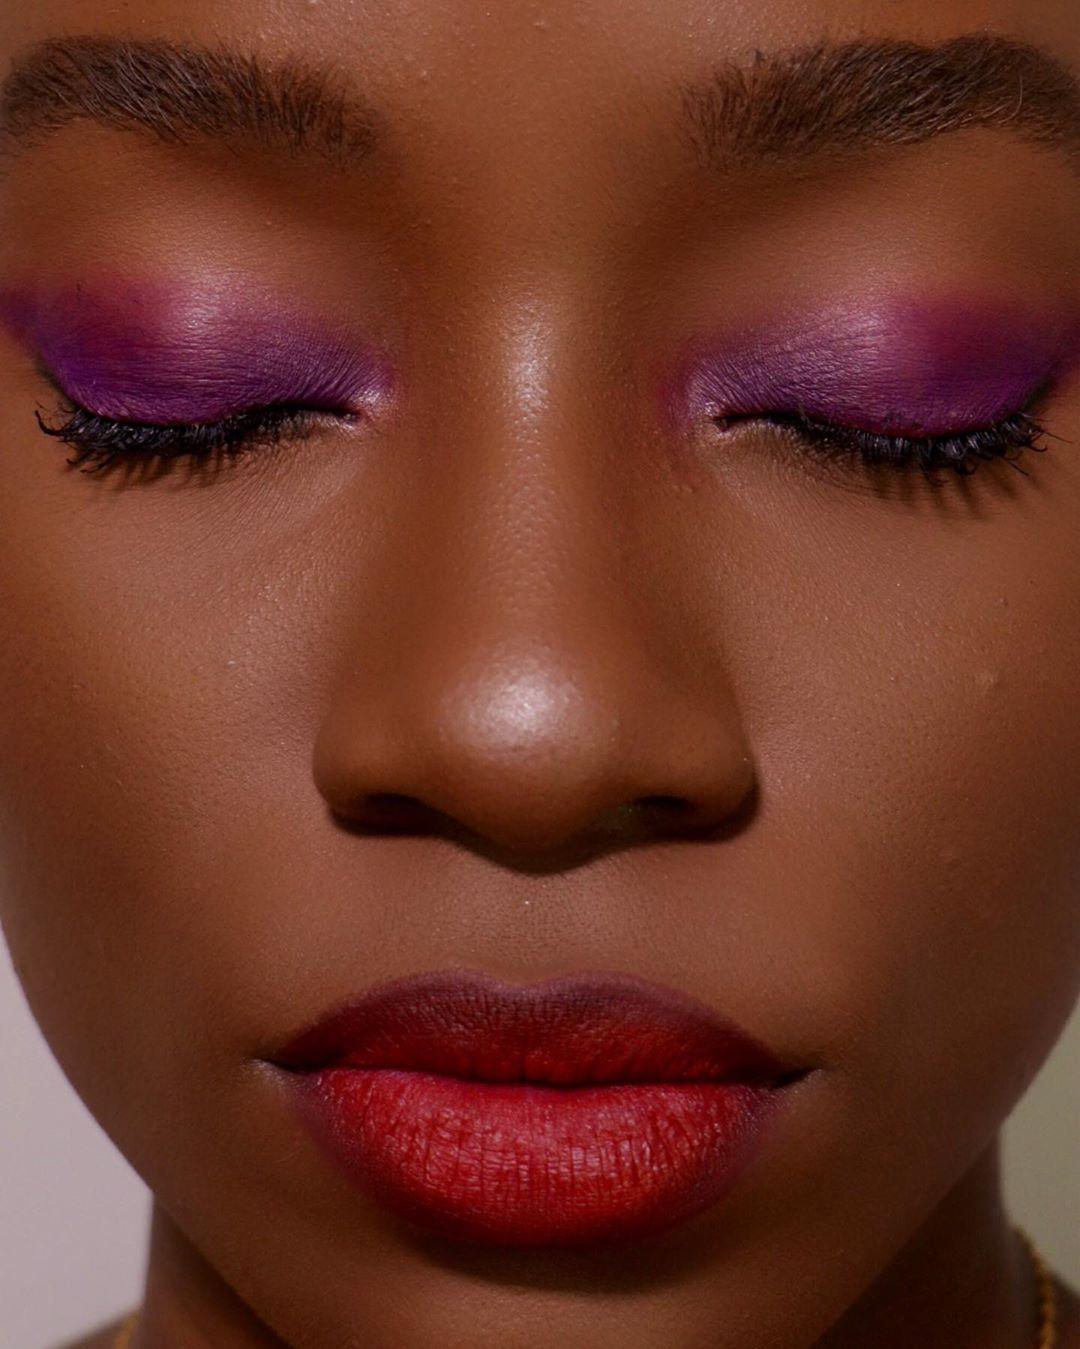 maquiagem colorida 3